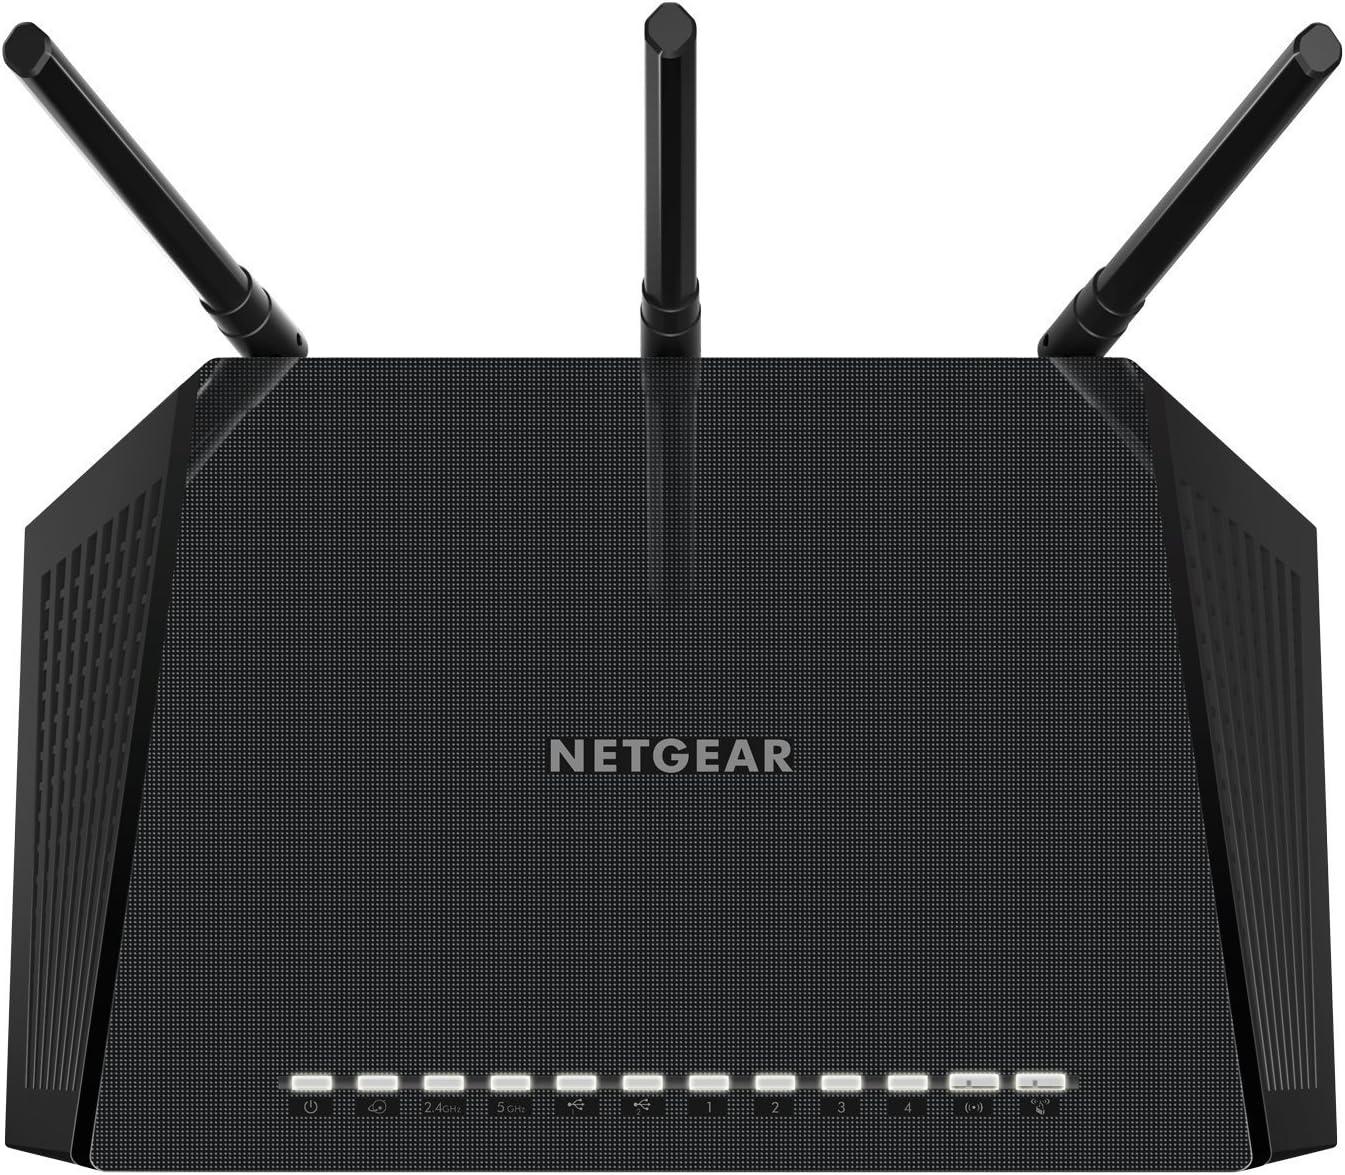 Netgear R6400 vs R7000